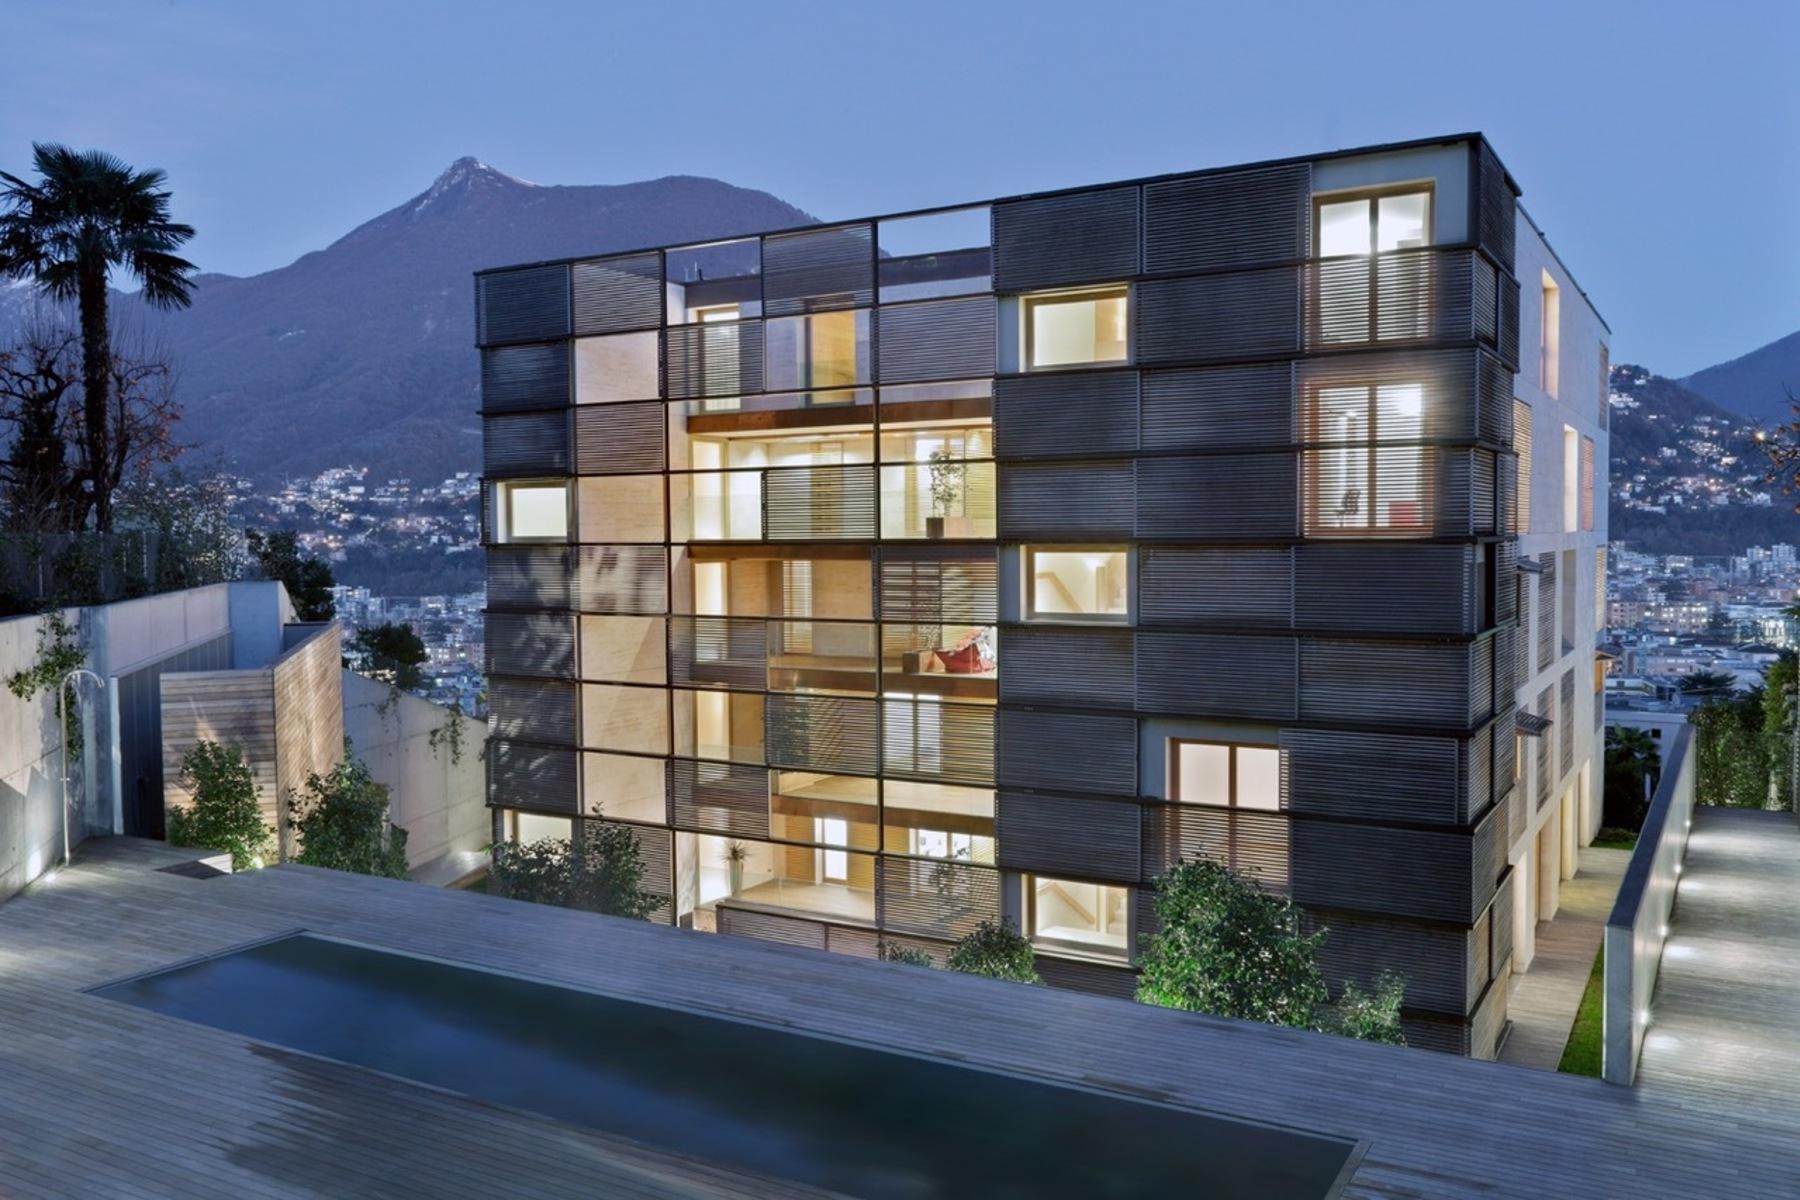 Квартира для того Продажа на Apartment in the design-residence Lomocubes Massagno, Massagno, Ticino, 6908 Швейцария